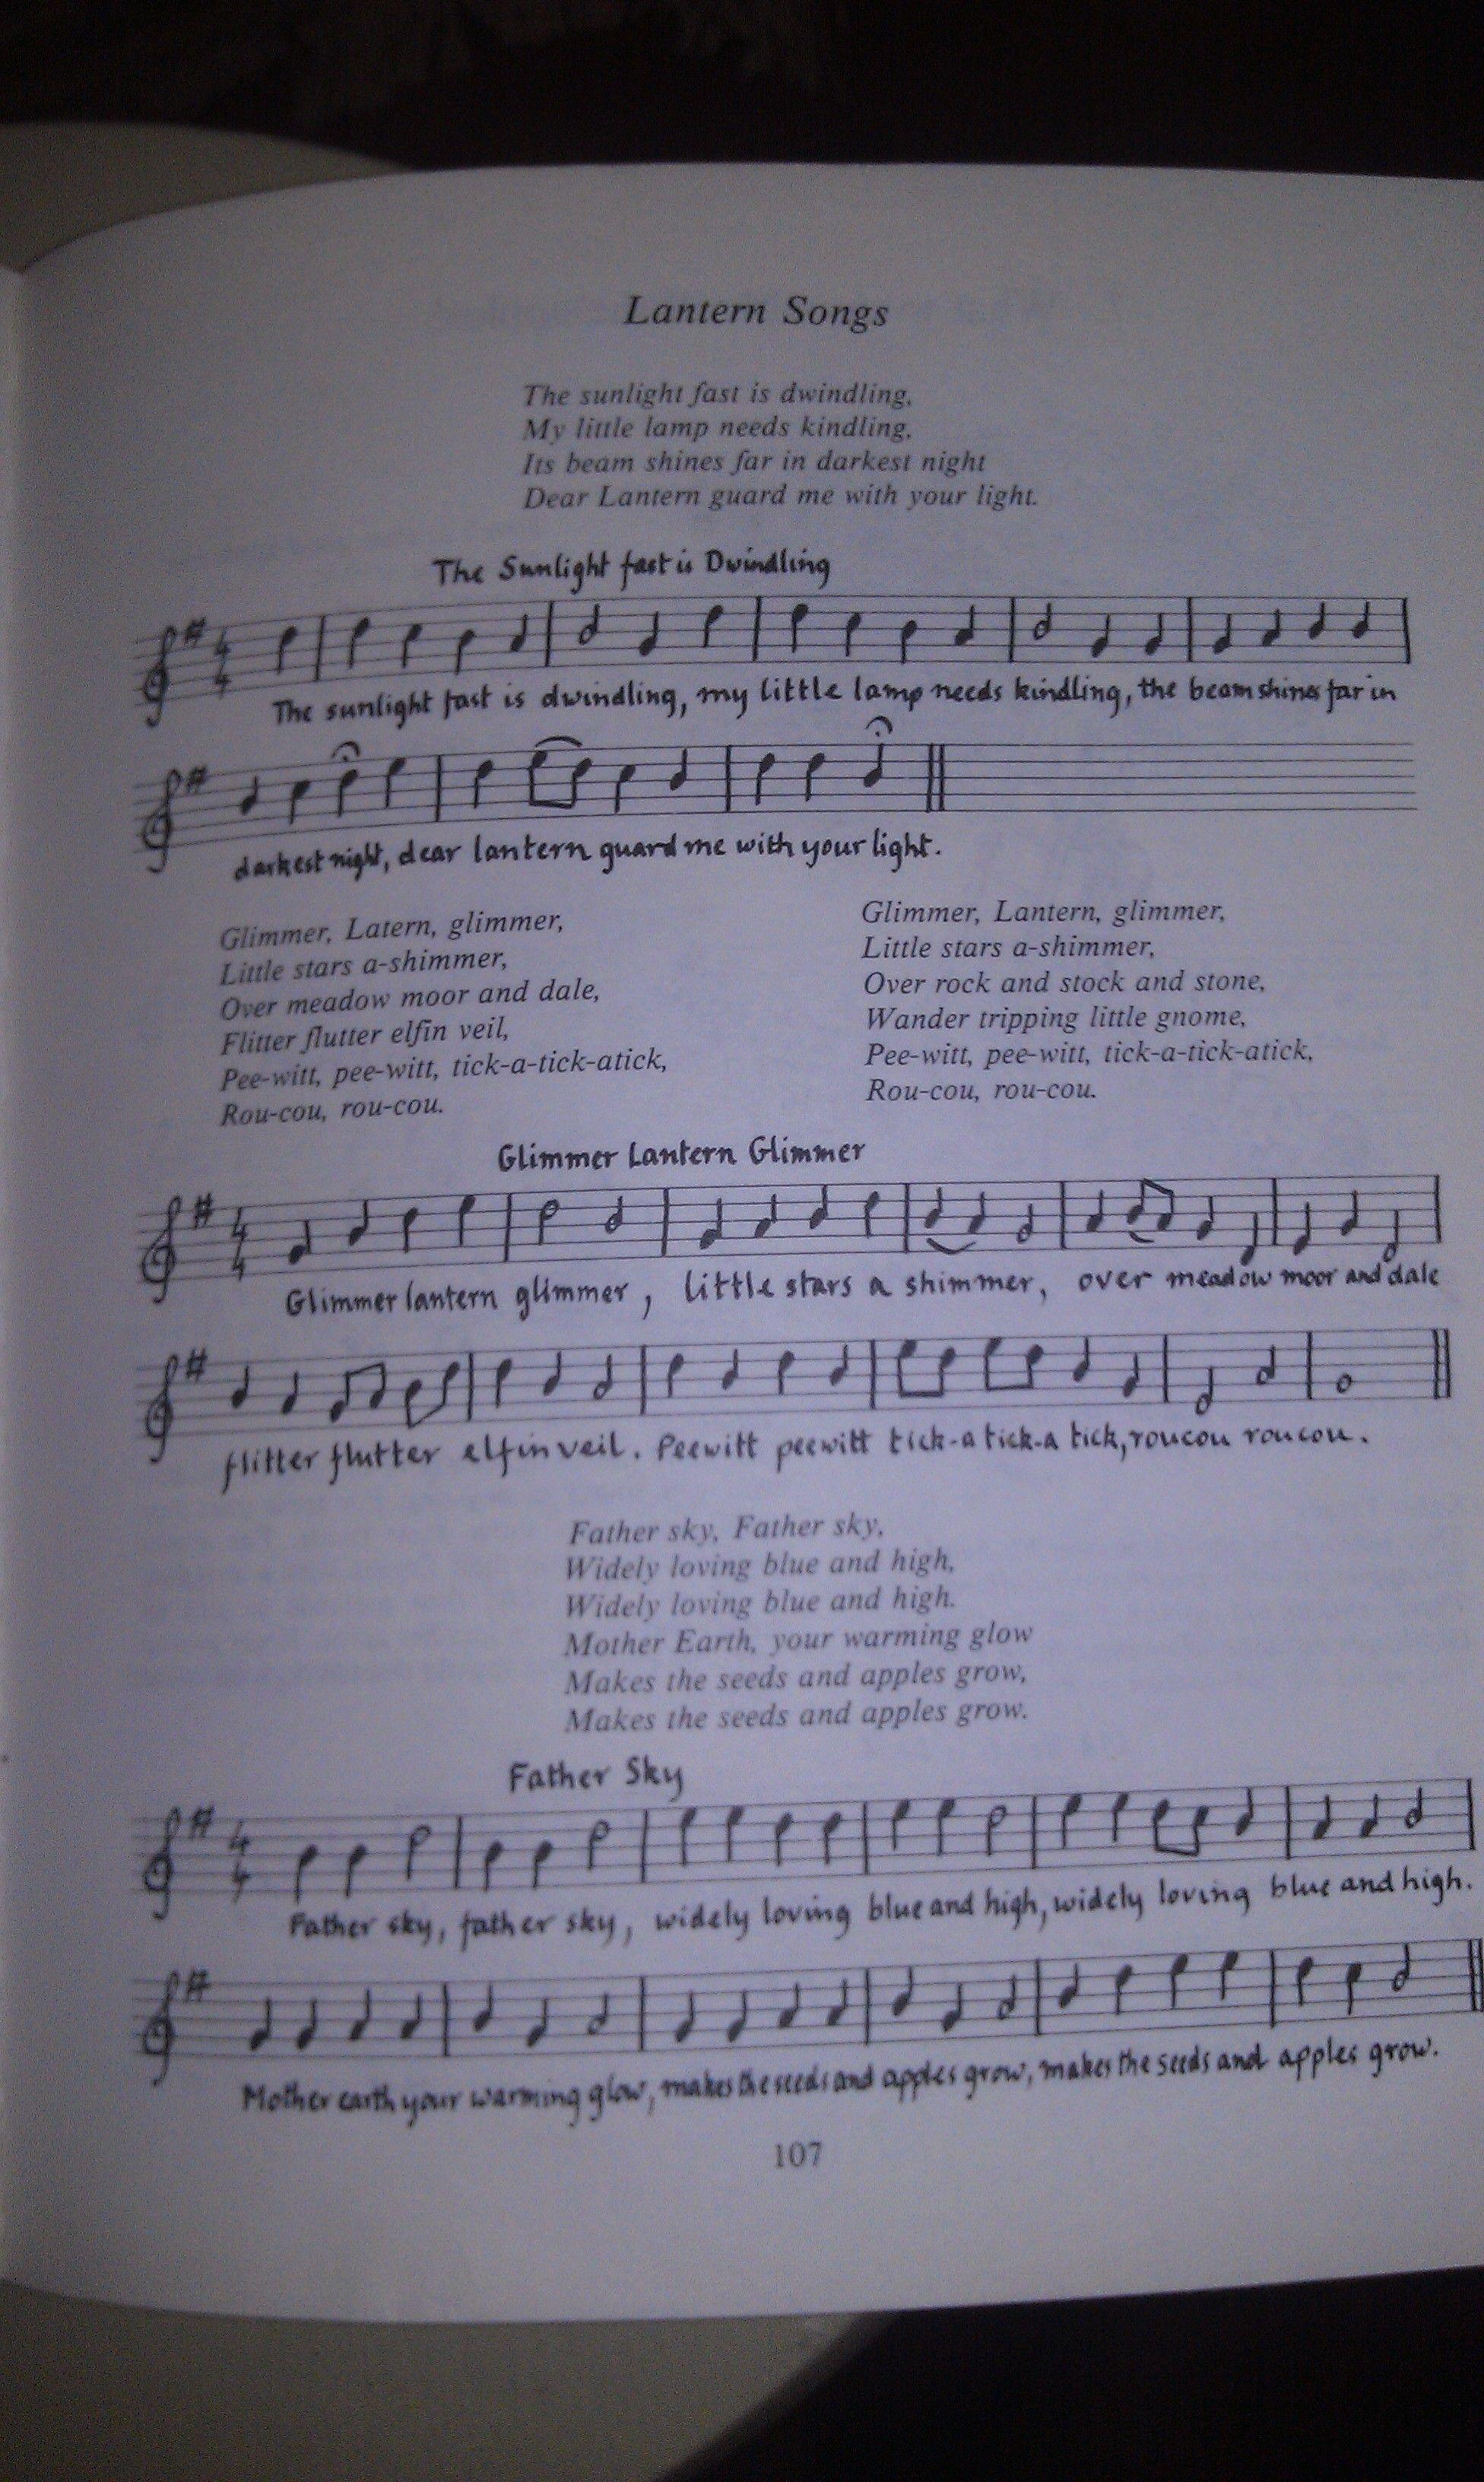 Lantern Songs